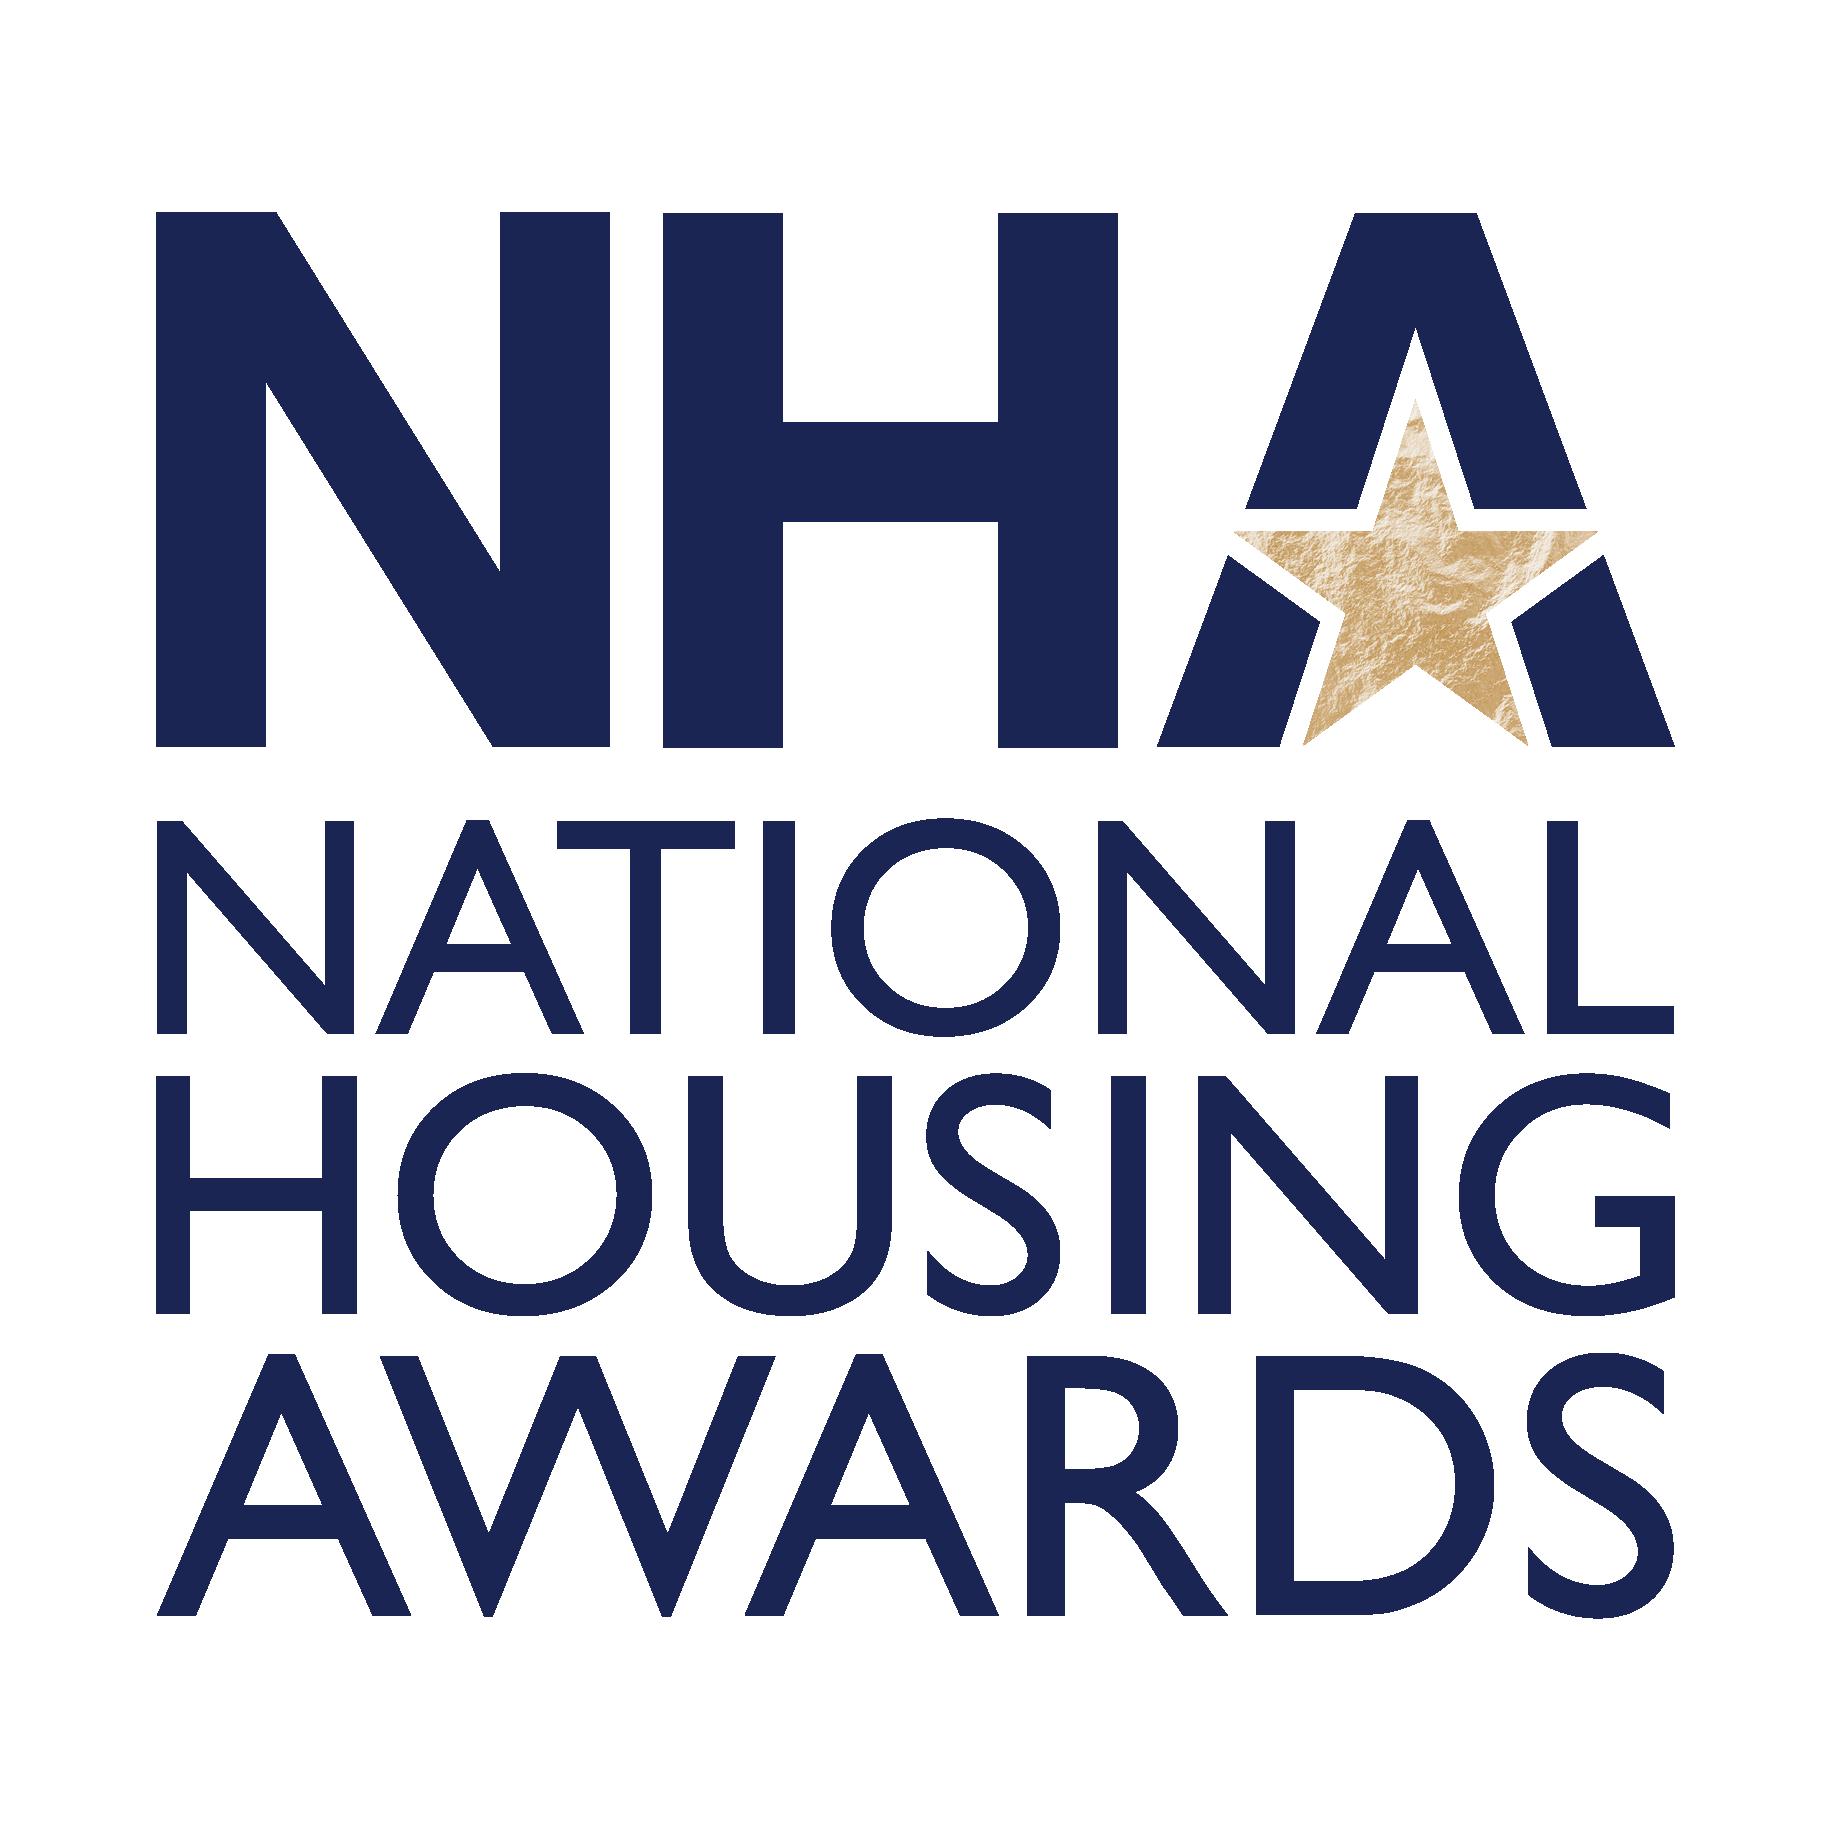 National Housing Awards